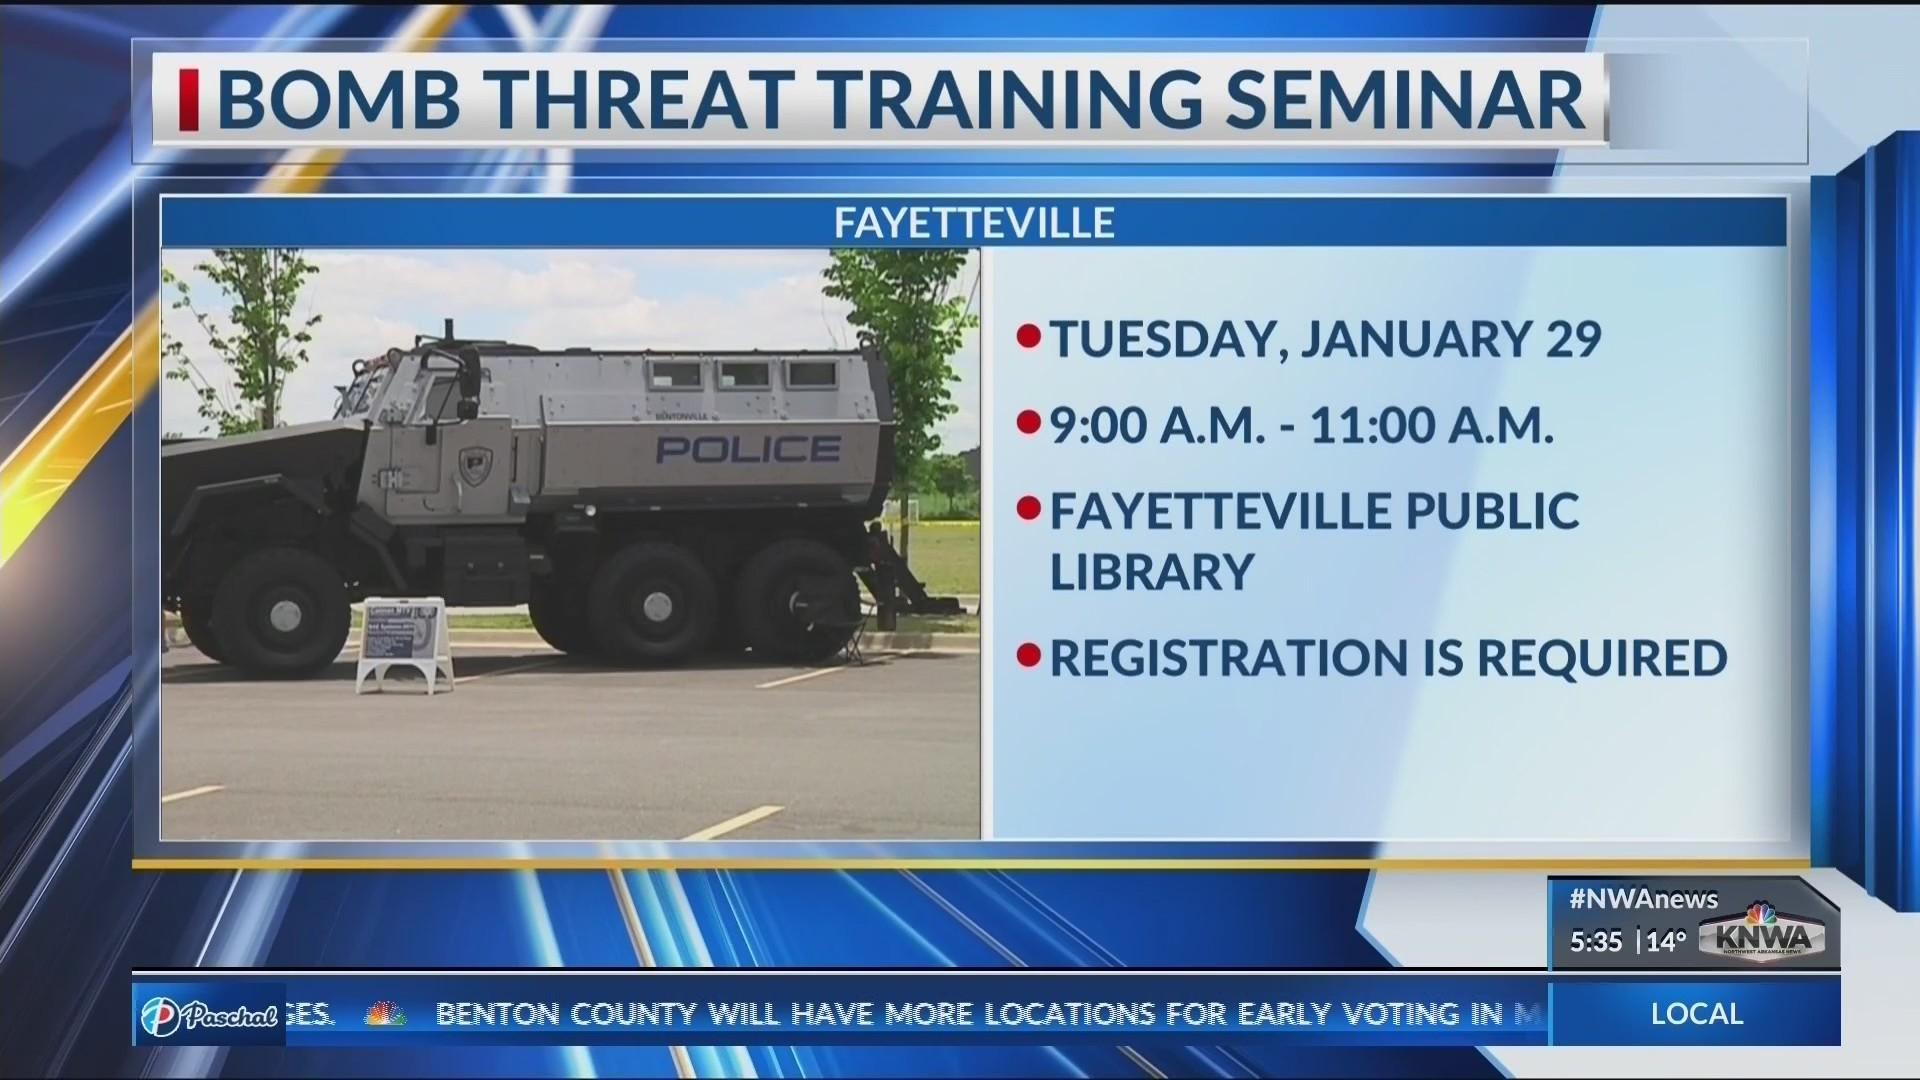 Fayetteville_Hosts_Bomb_Threat_Training__0_20190129132702